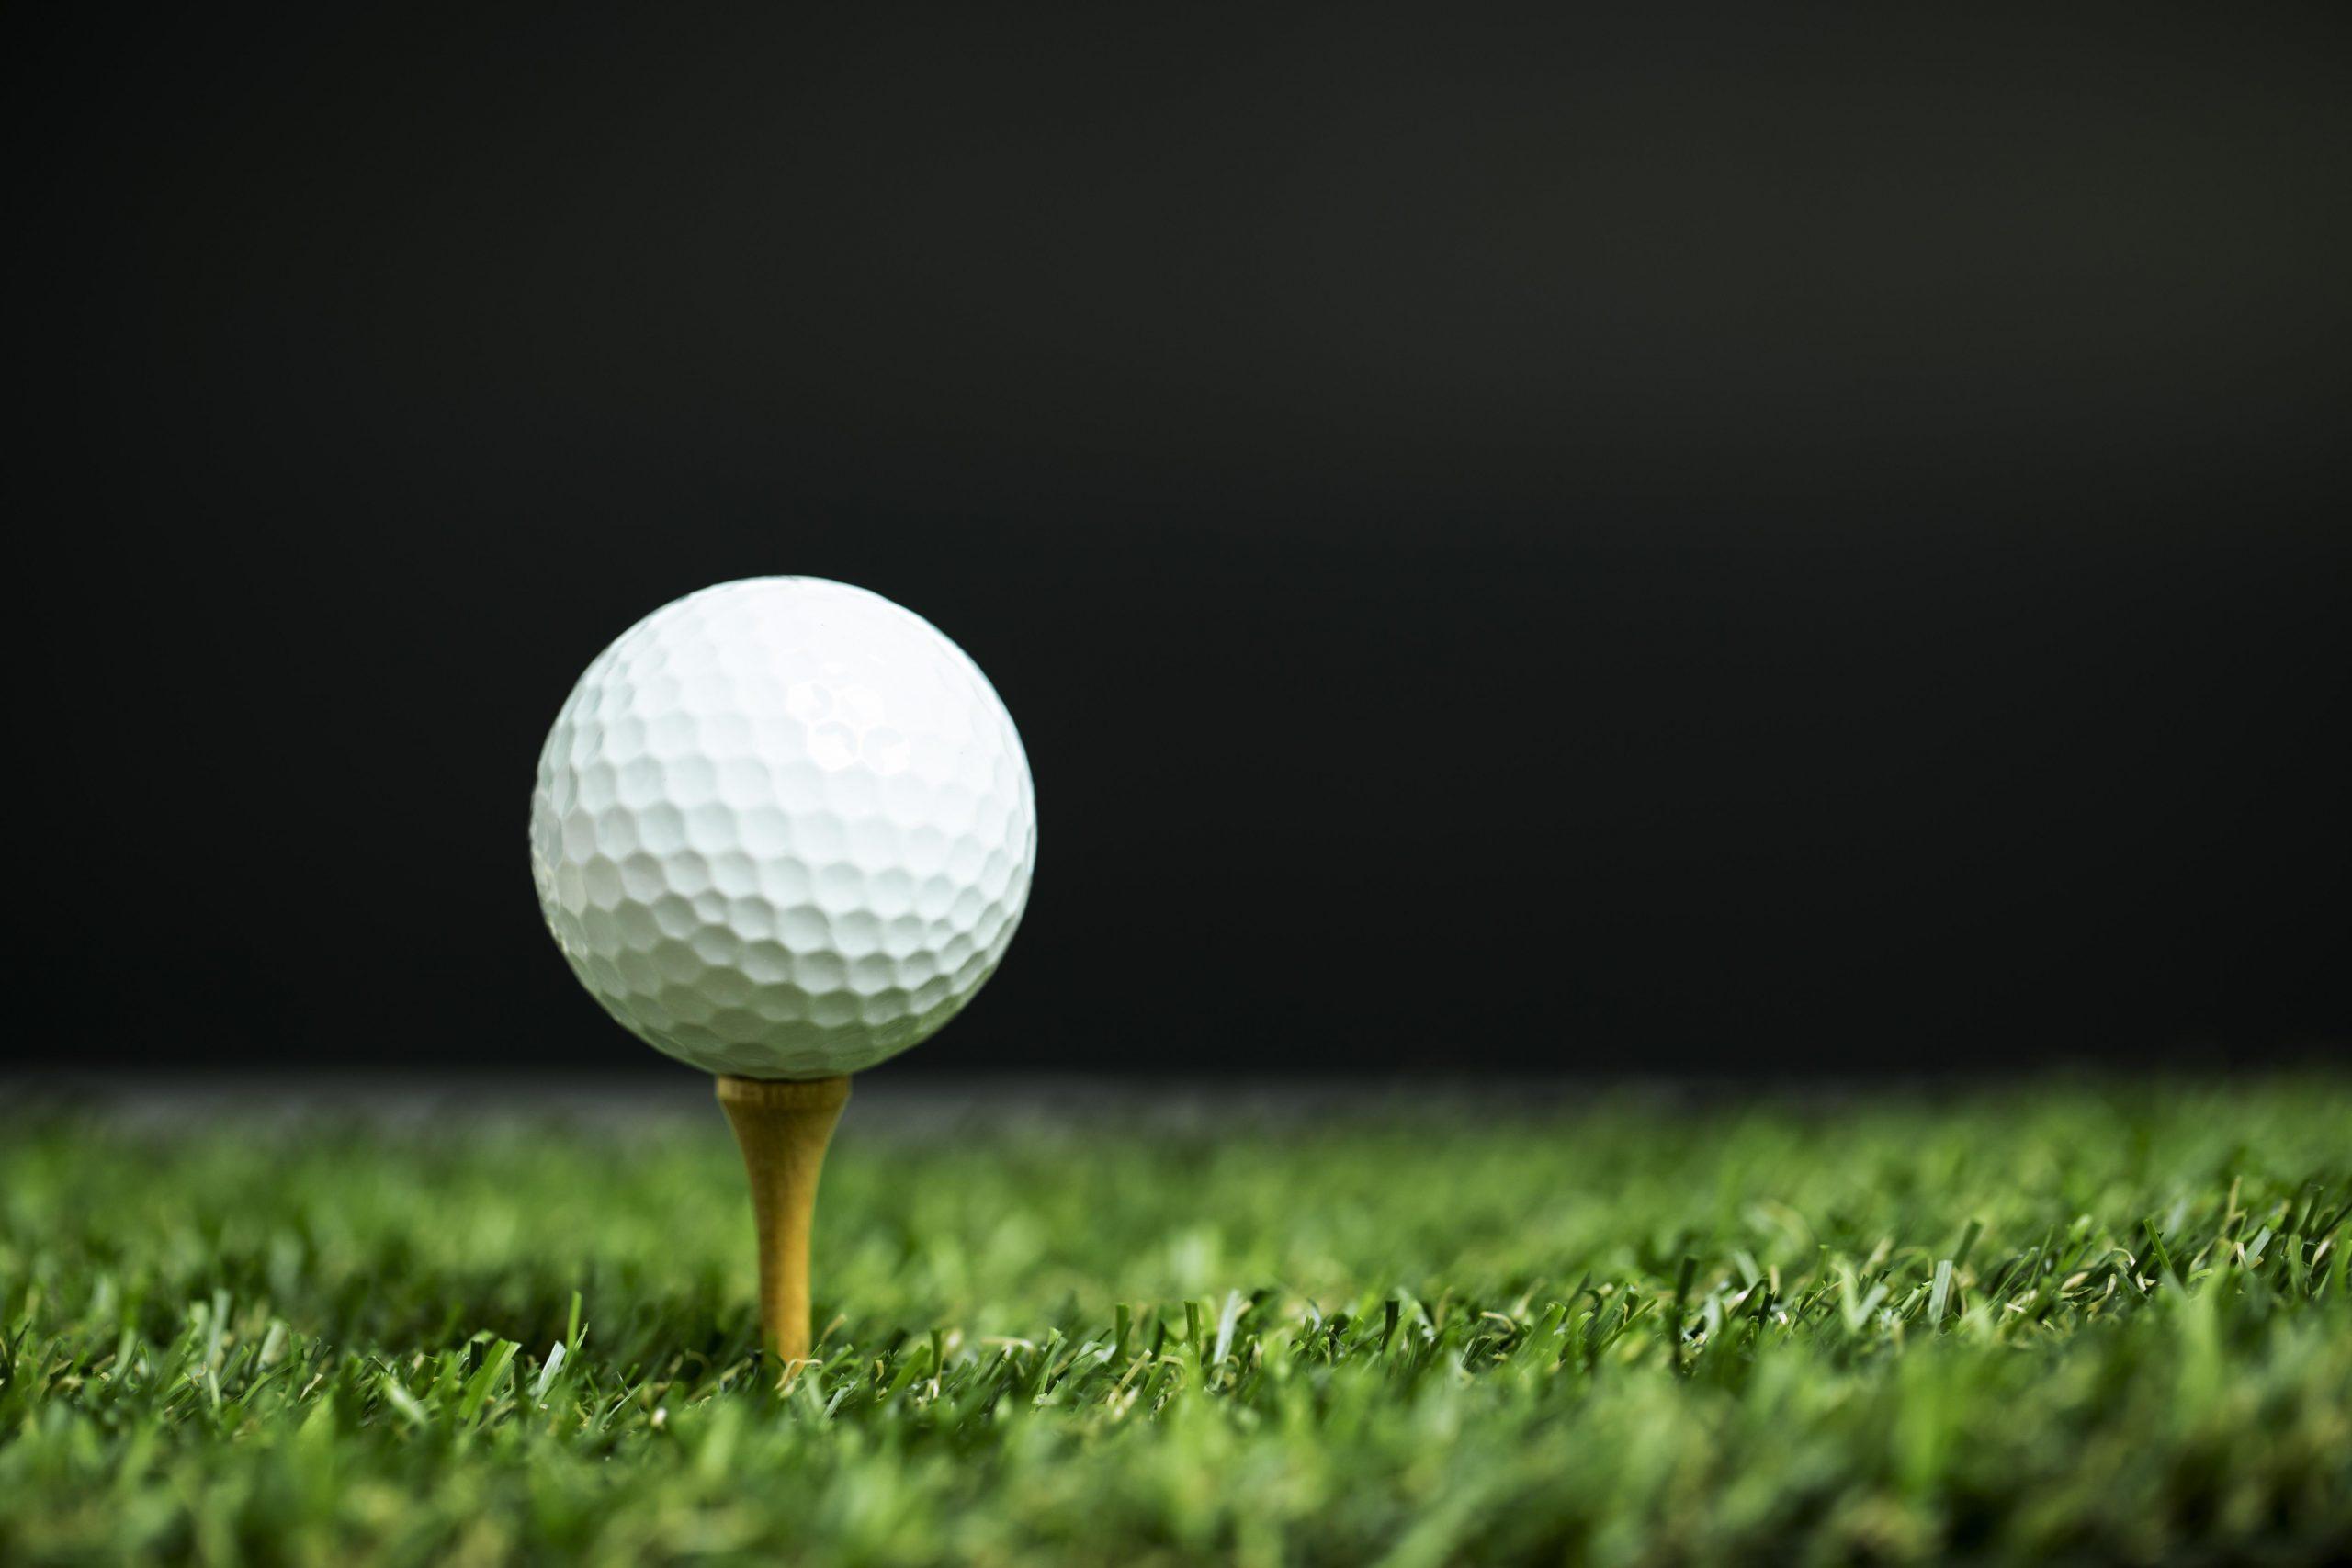 2021 COW Charity Golf Classic - 14th Annual